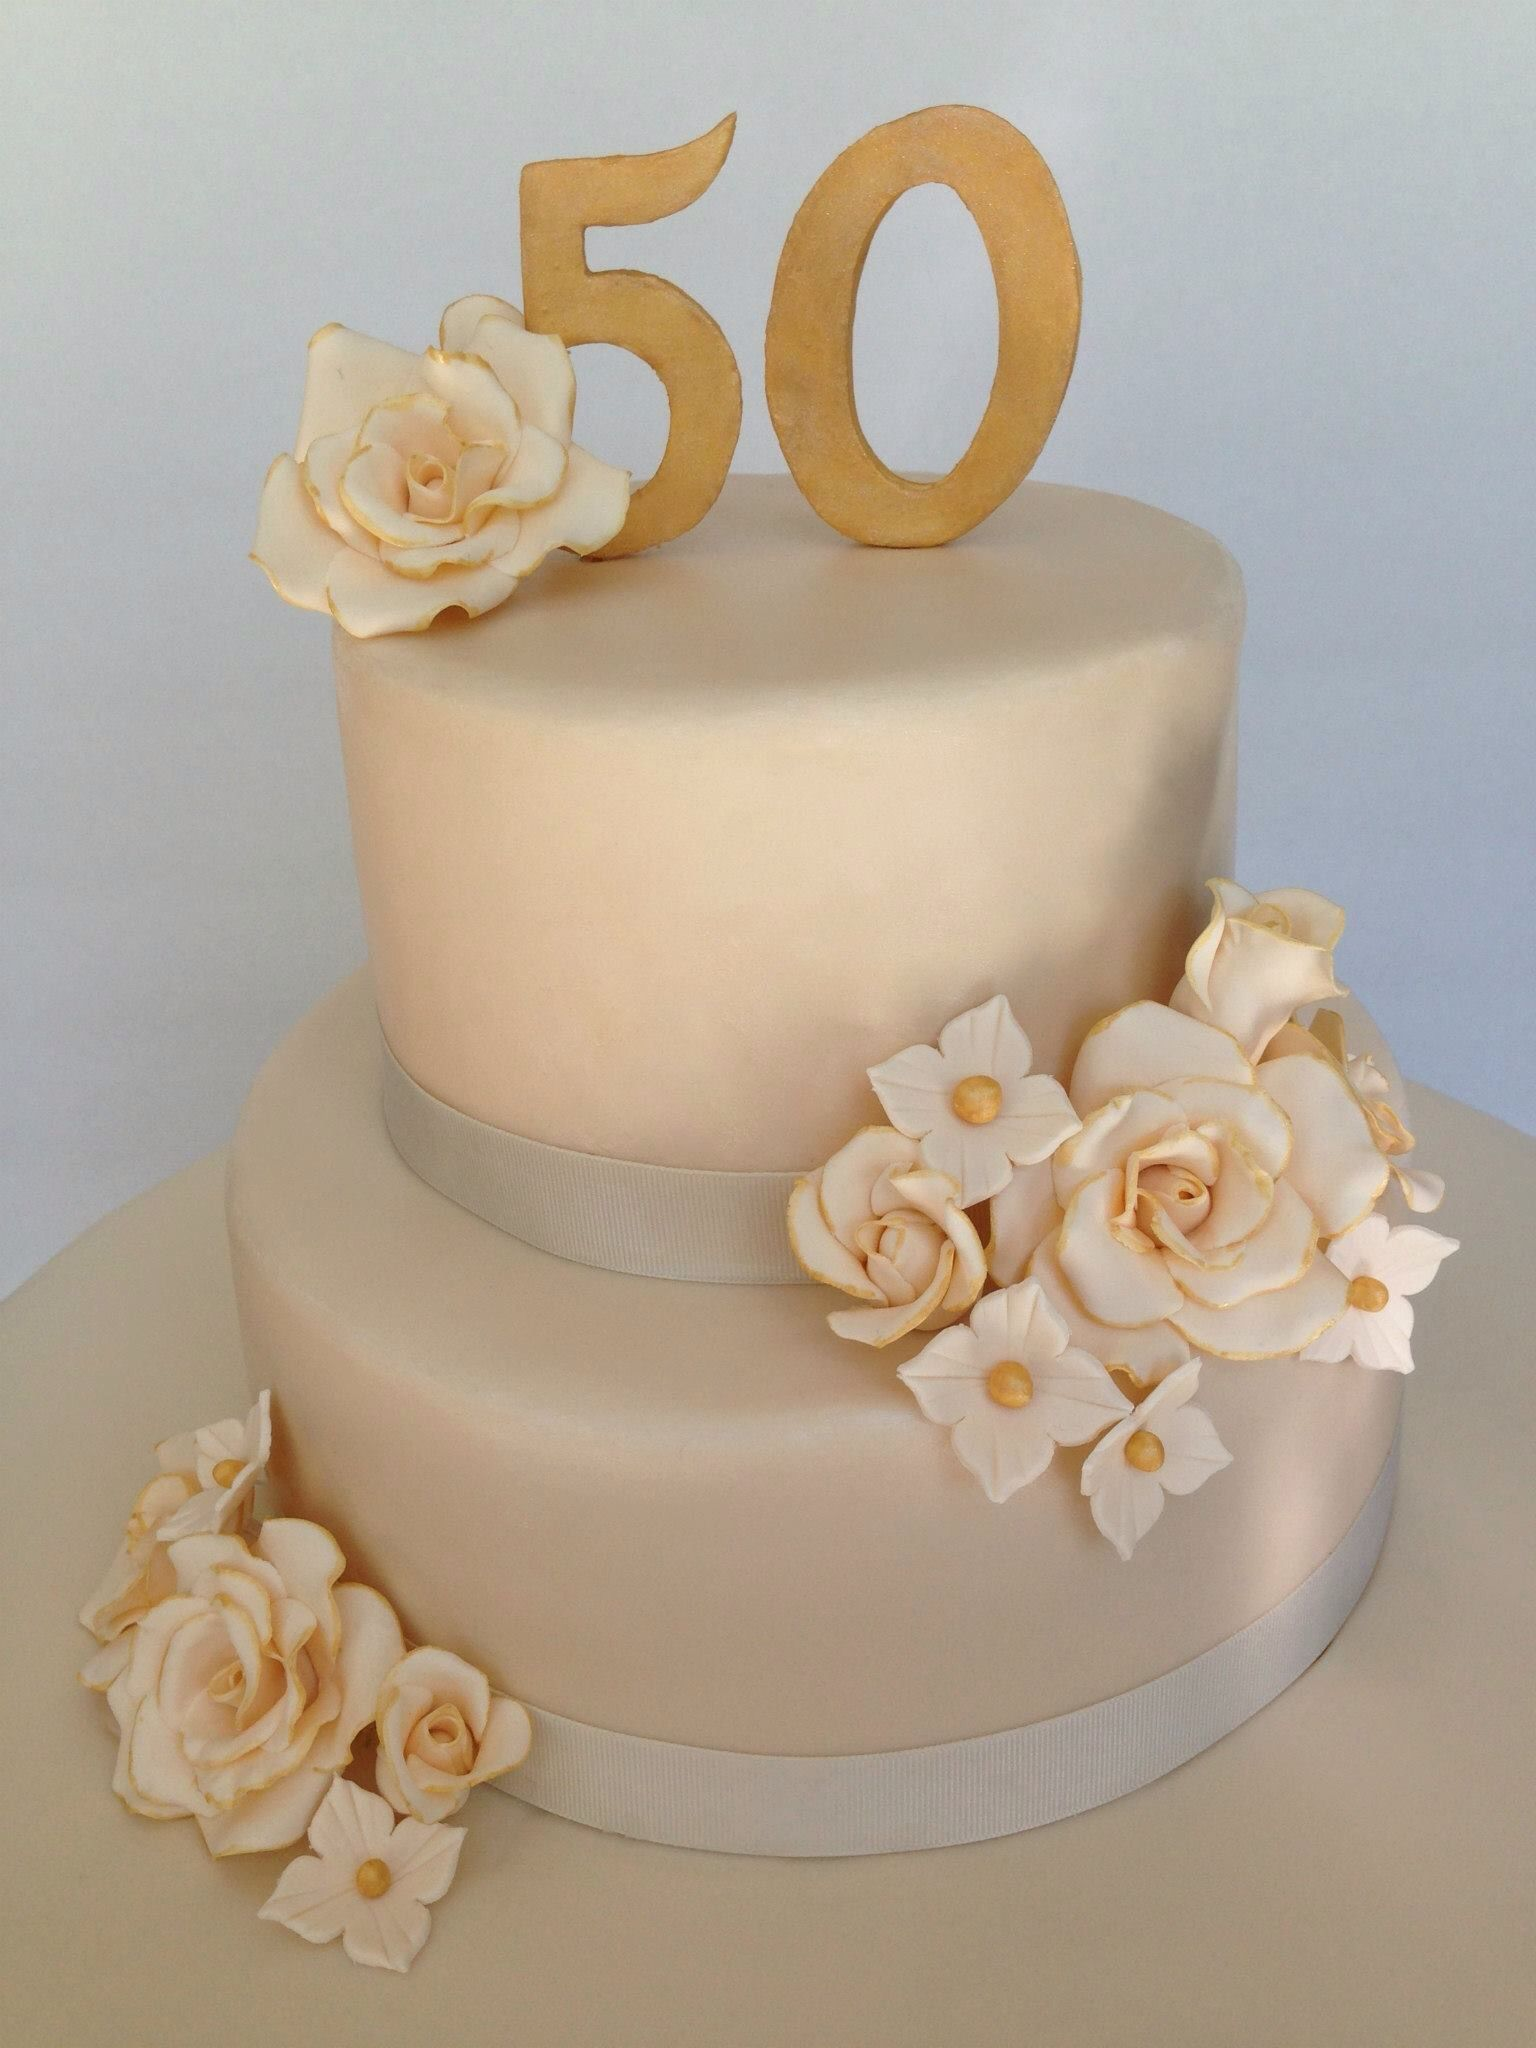 50th wedding anniversary cake simple yet elegant my for 50e anniversaire de mariage